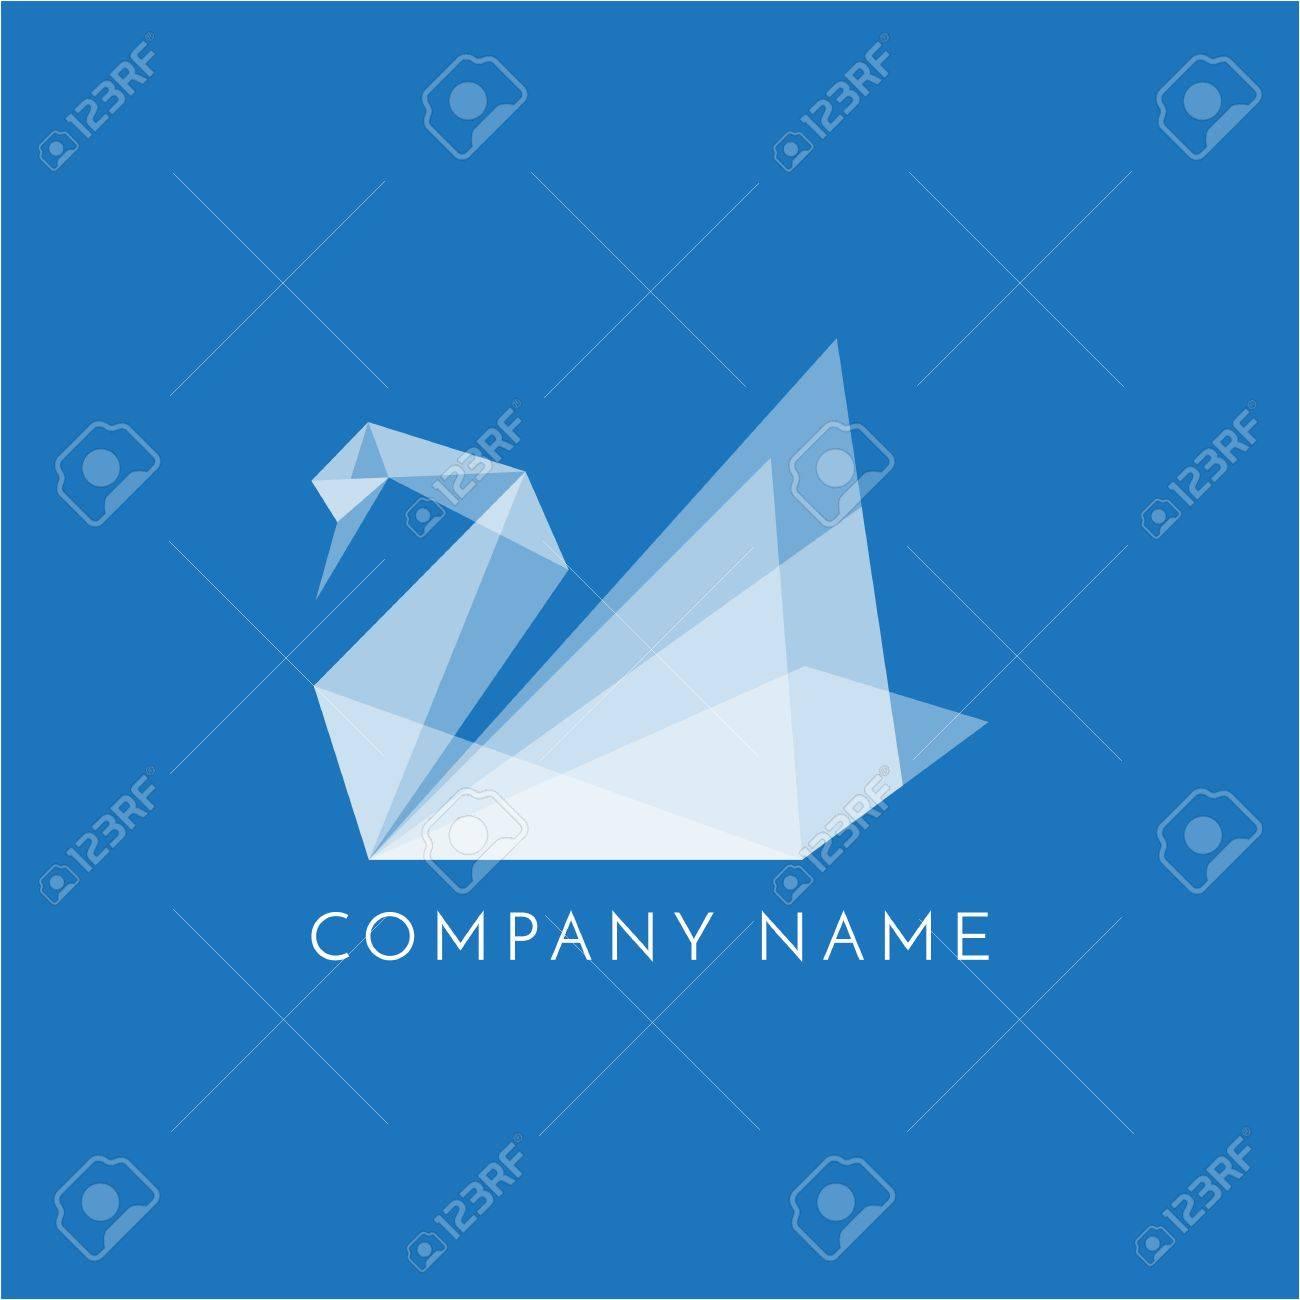 Swan logo origami sign on blue background stock photo picture and swan logo origami sign on blue background stock photo 87335926 jeuxipadfo Gallery